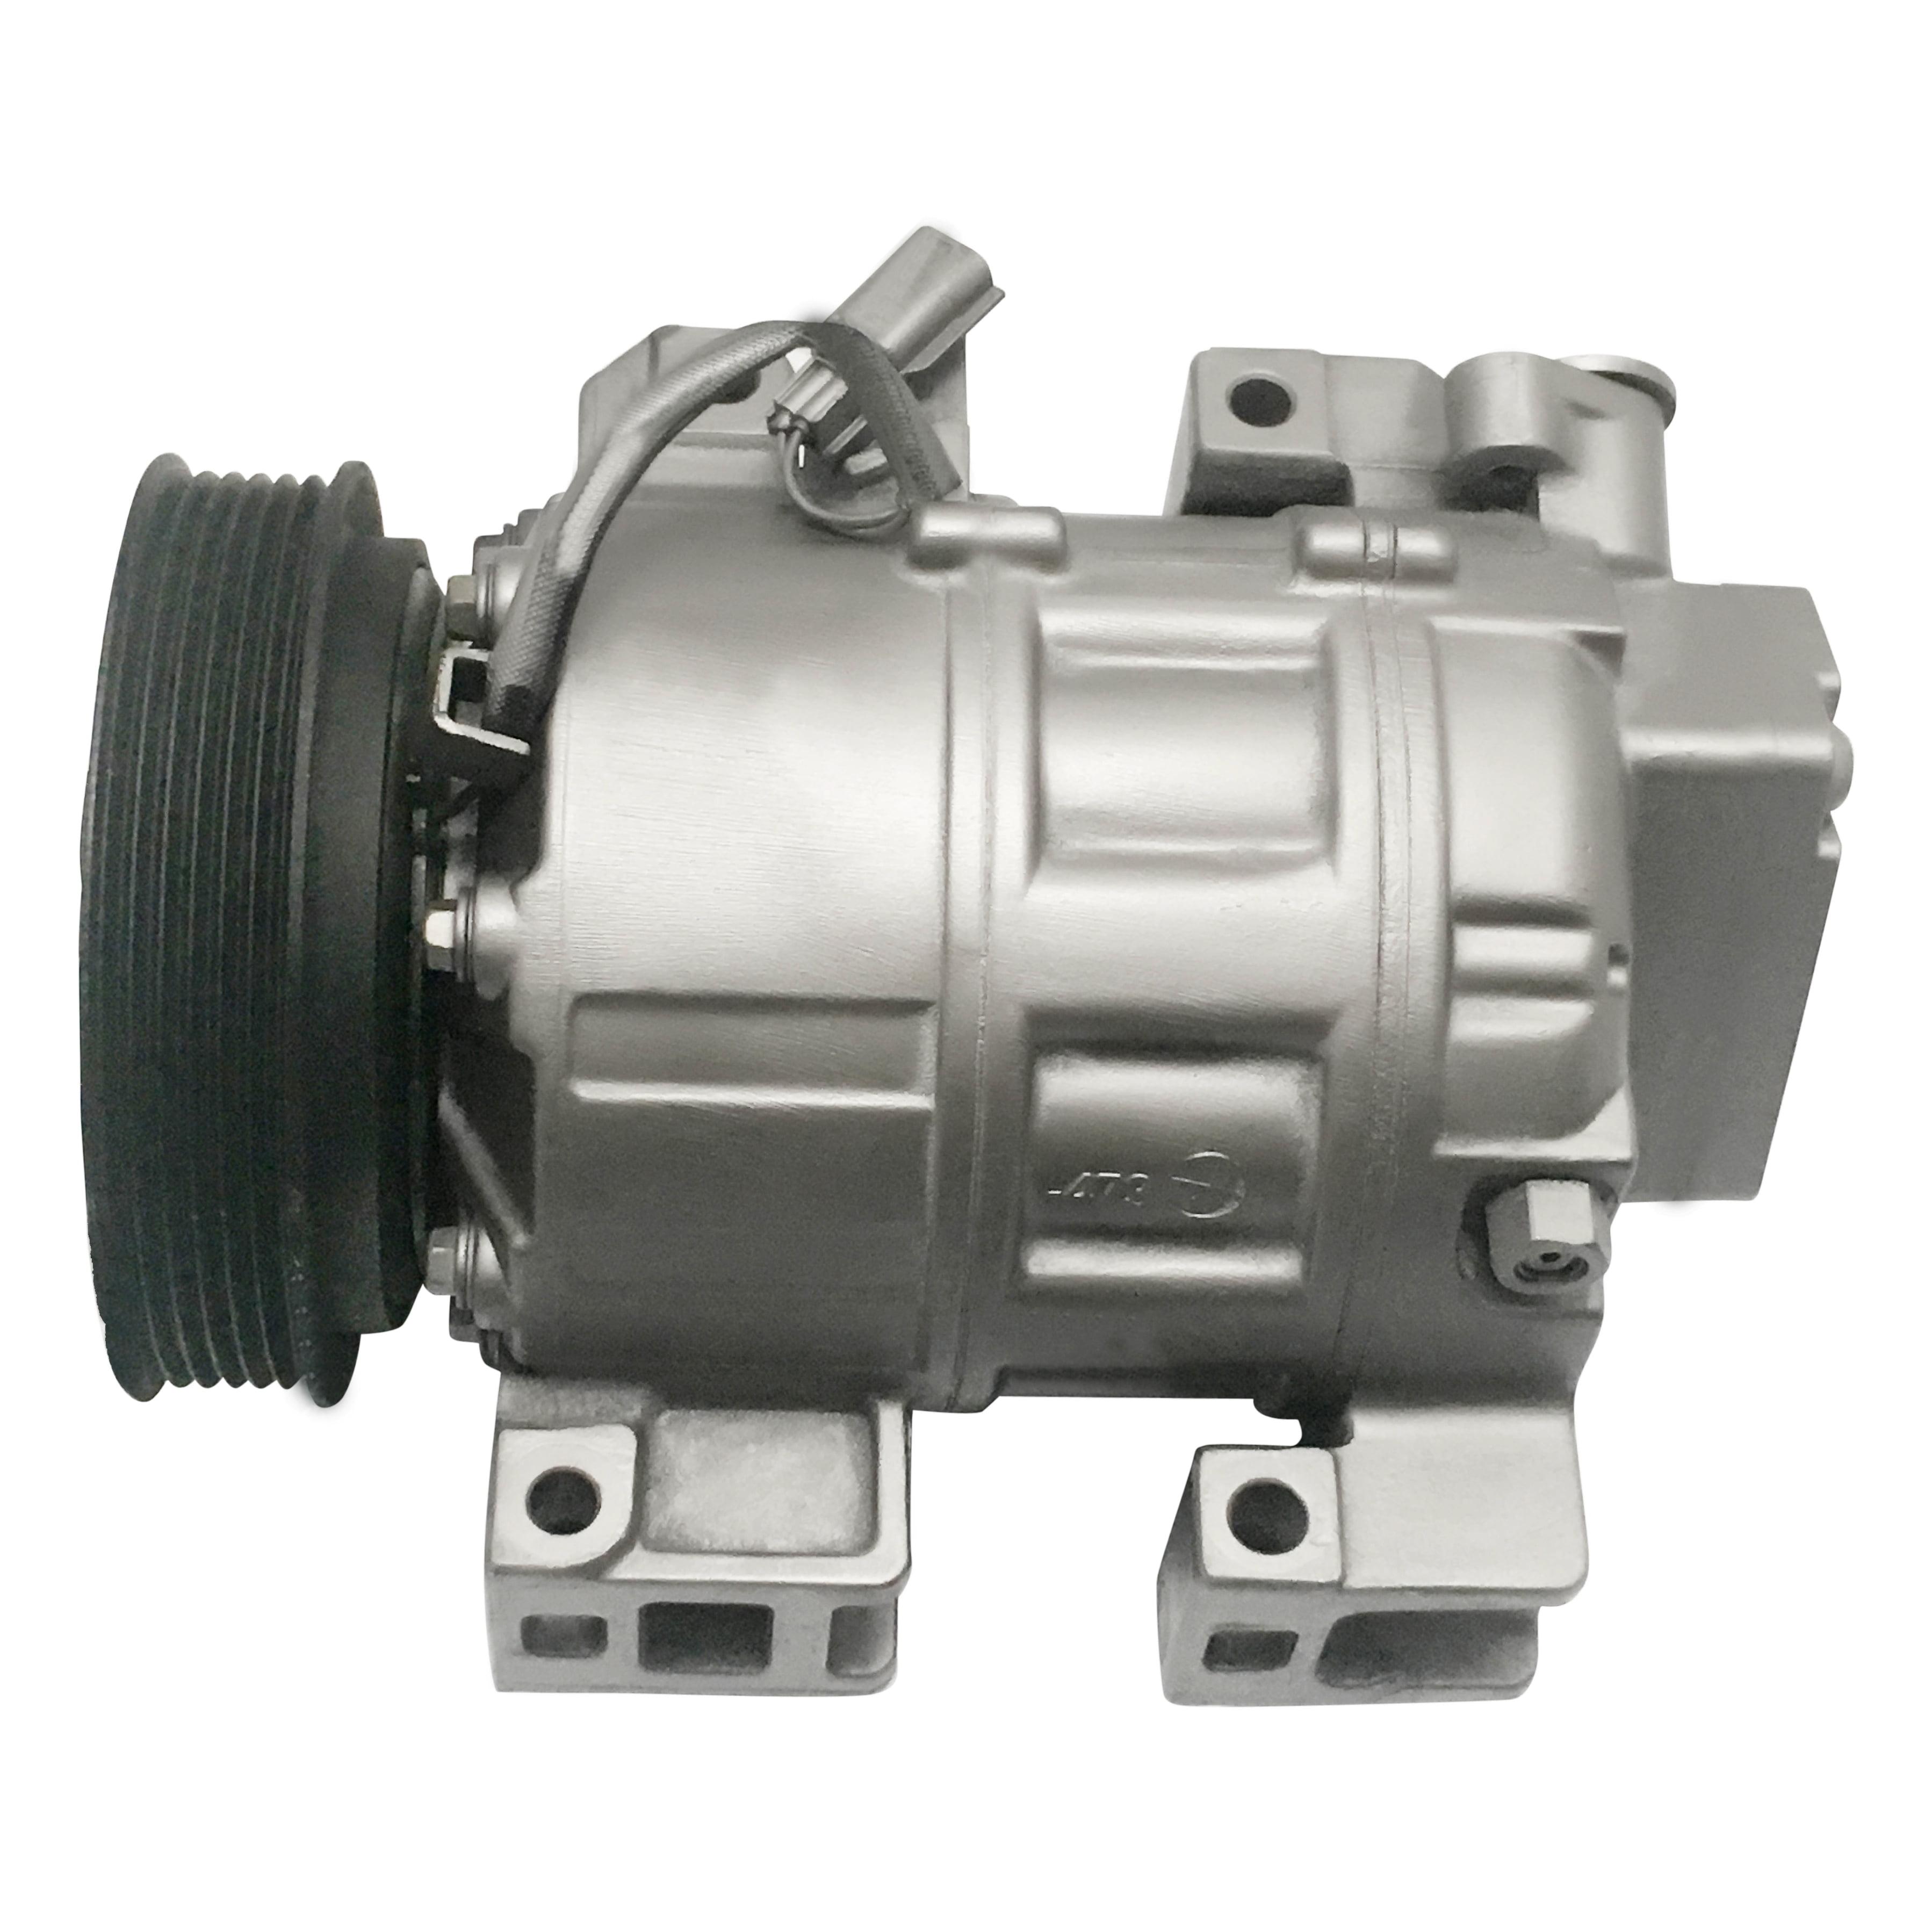 AC Compressor COMPLETE CLUTCH Assembly Fits 2002 Nissan Altima 2.5 Liter A//C